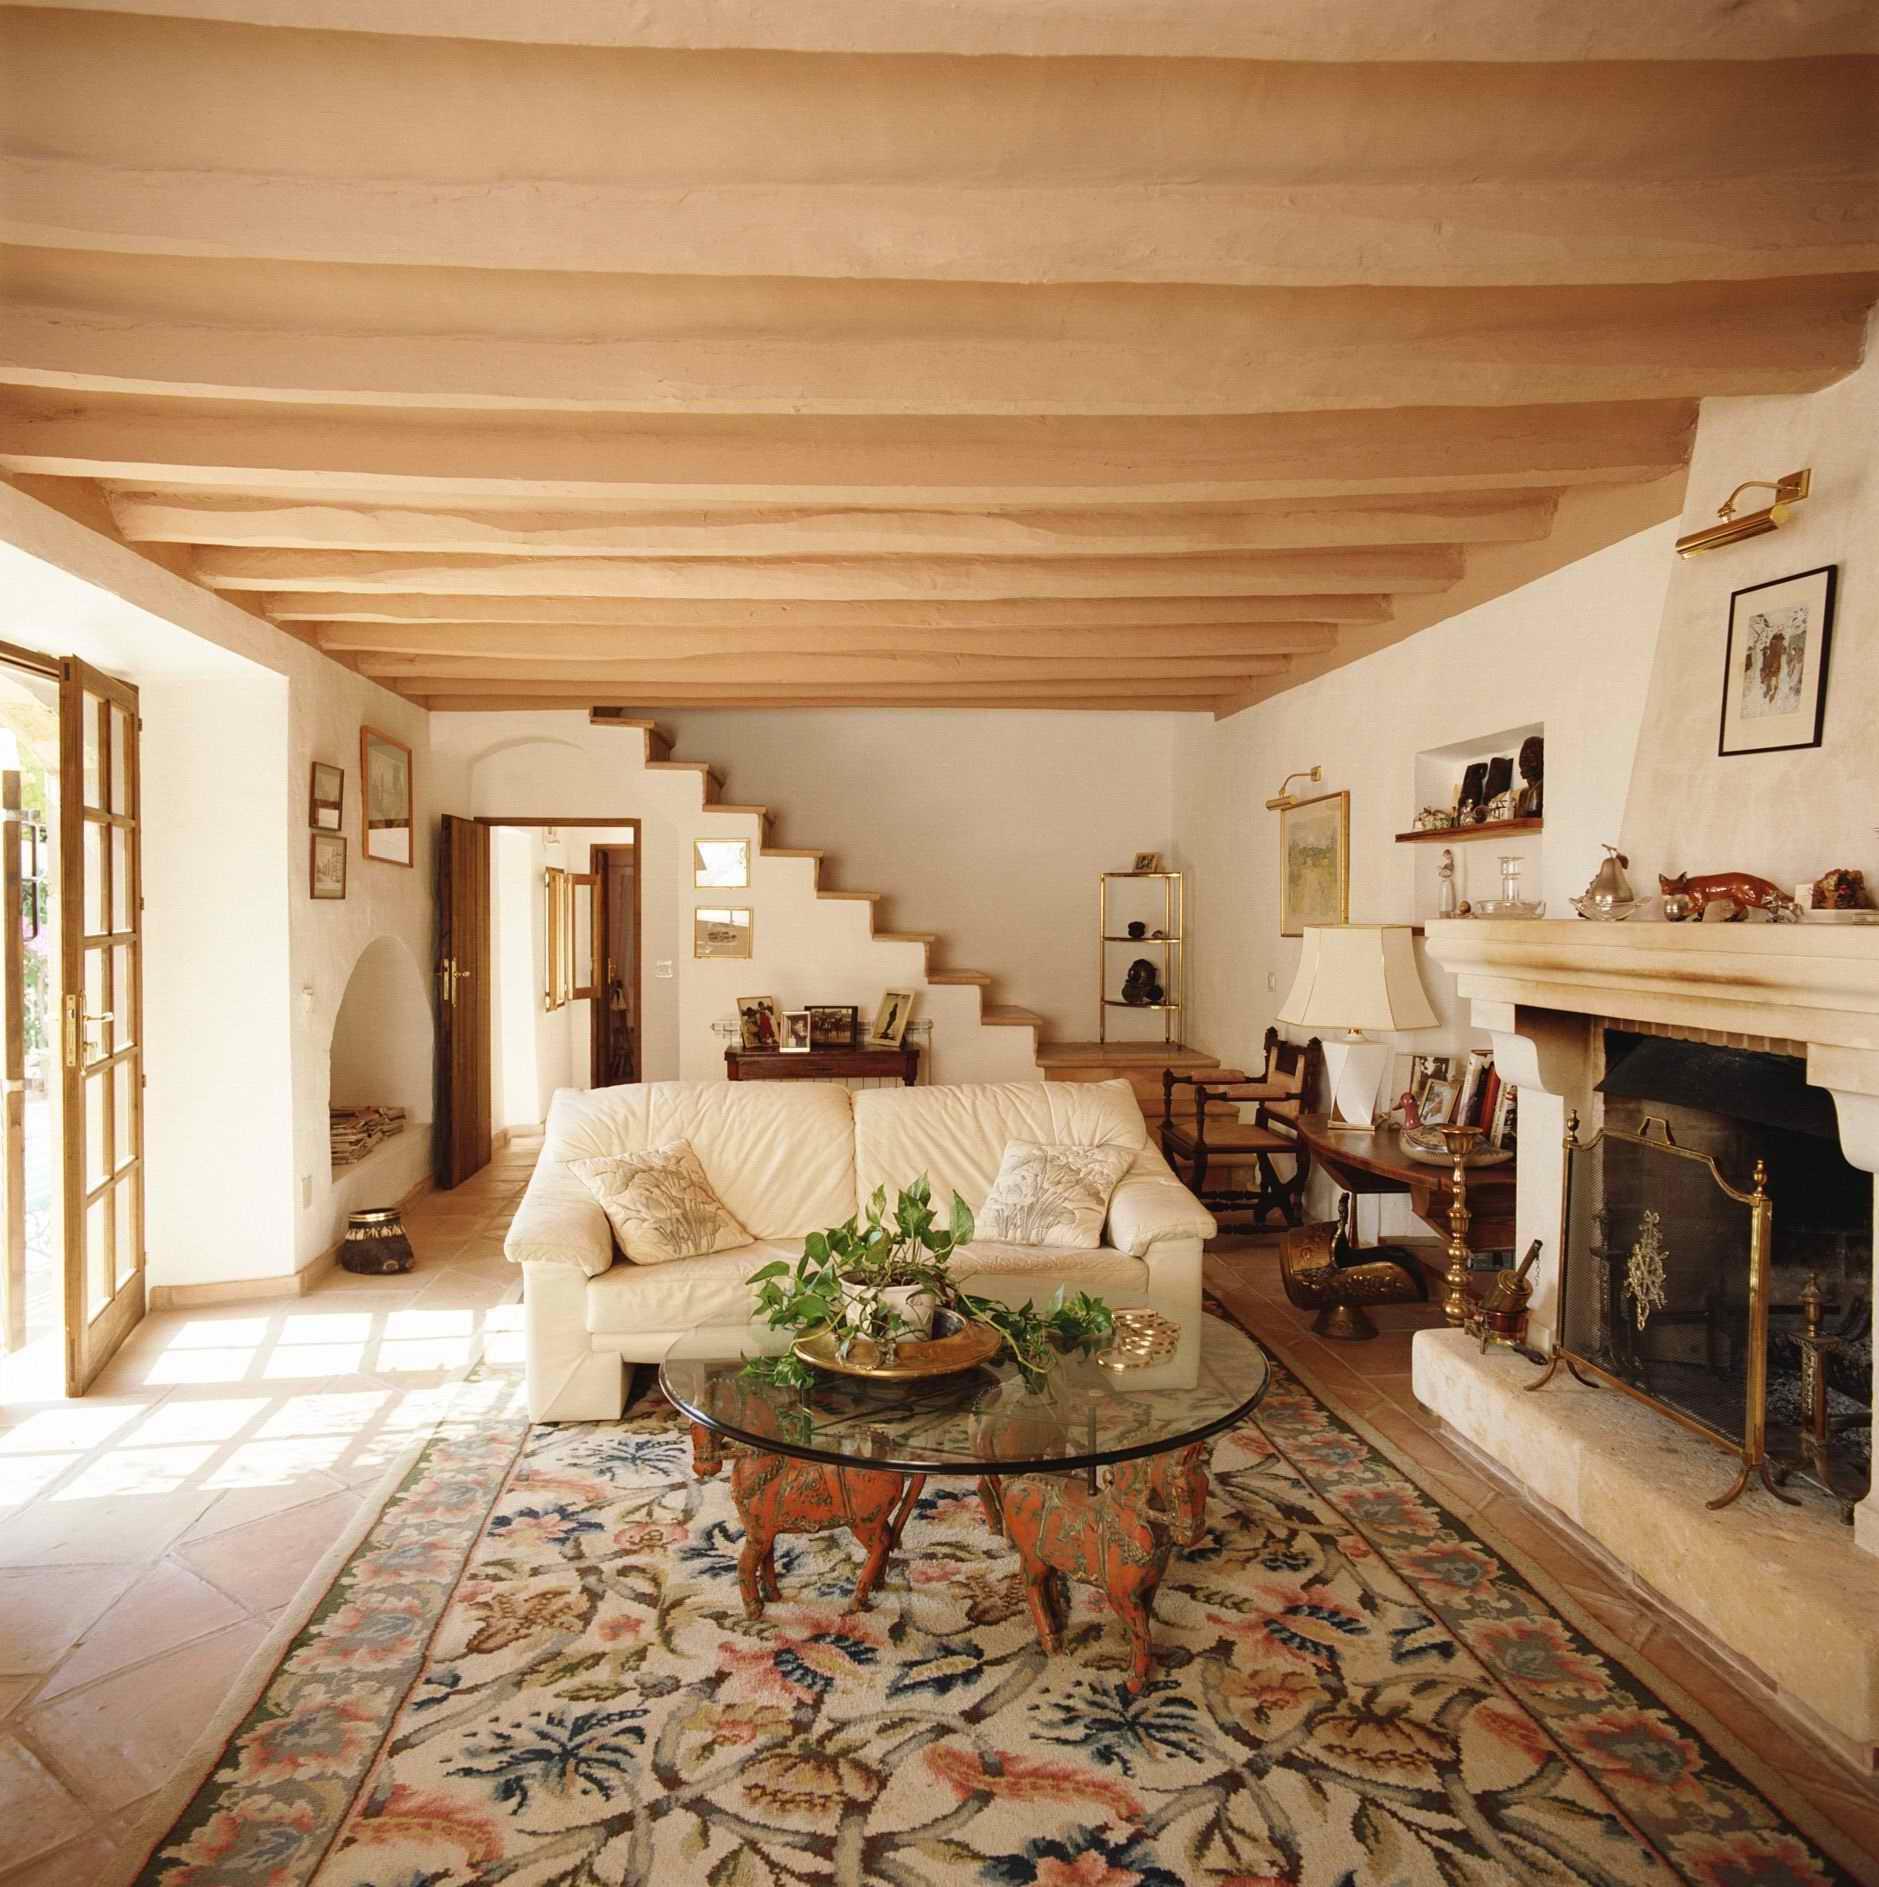 Дизайн интерьера интерьер гостиной